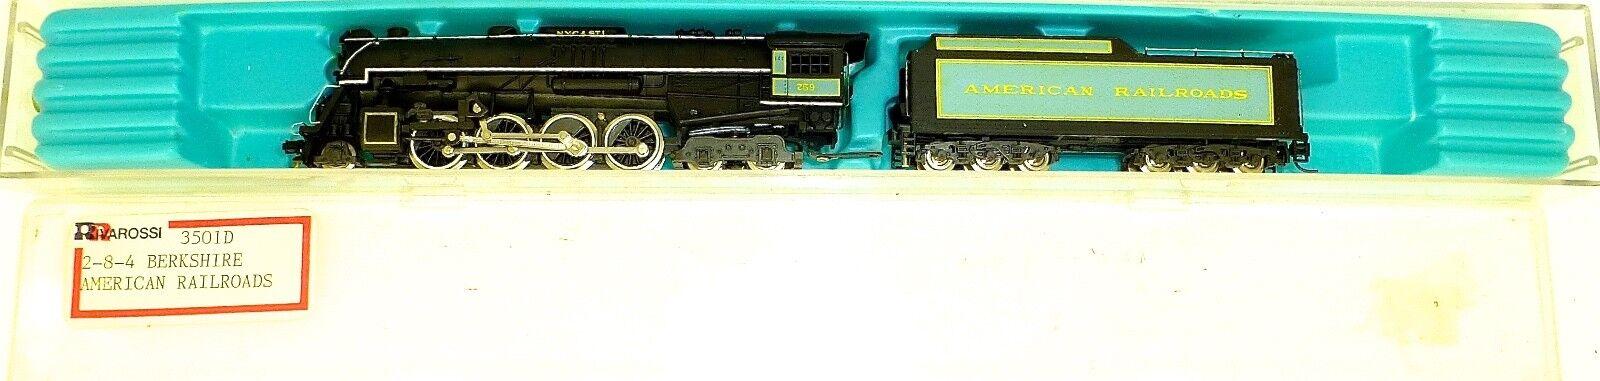 Rivarossi 3501D 2 8 4 Berkshire American Railroads 759 759 759 Locomotora de Vapor 325df7